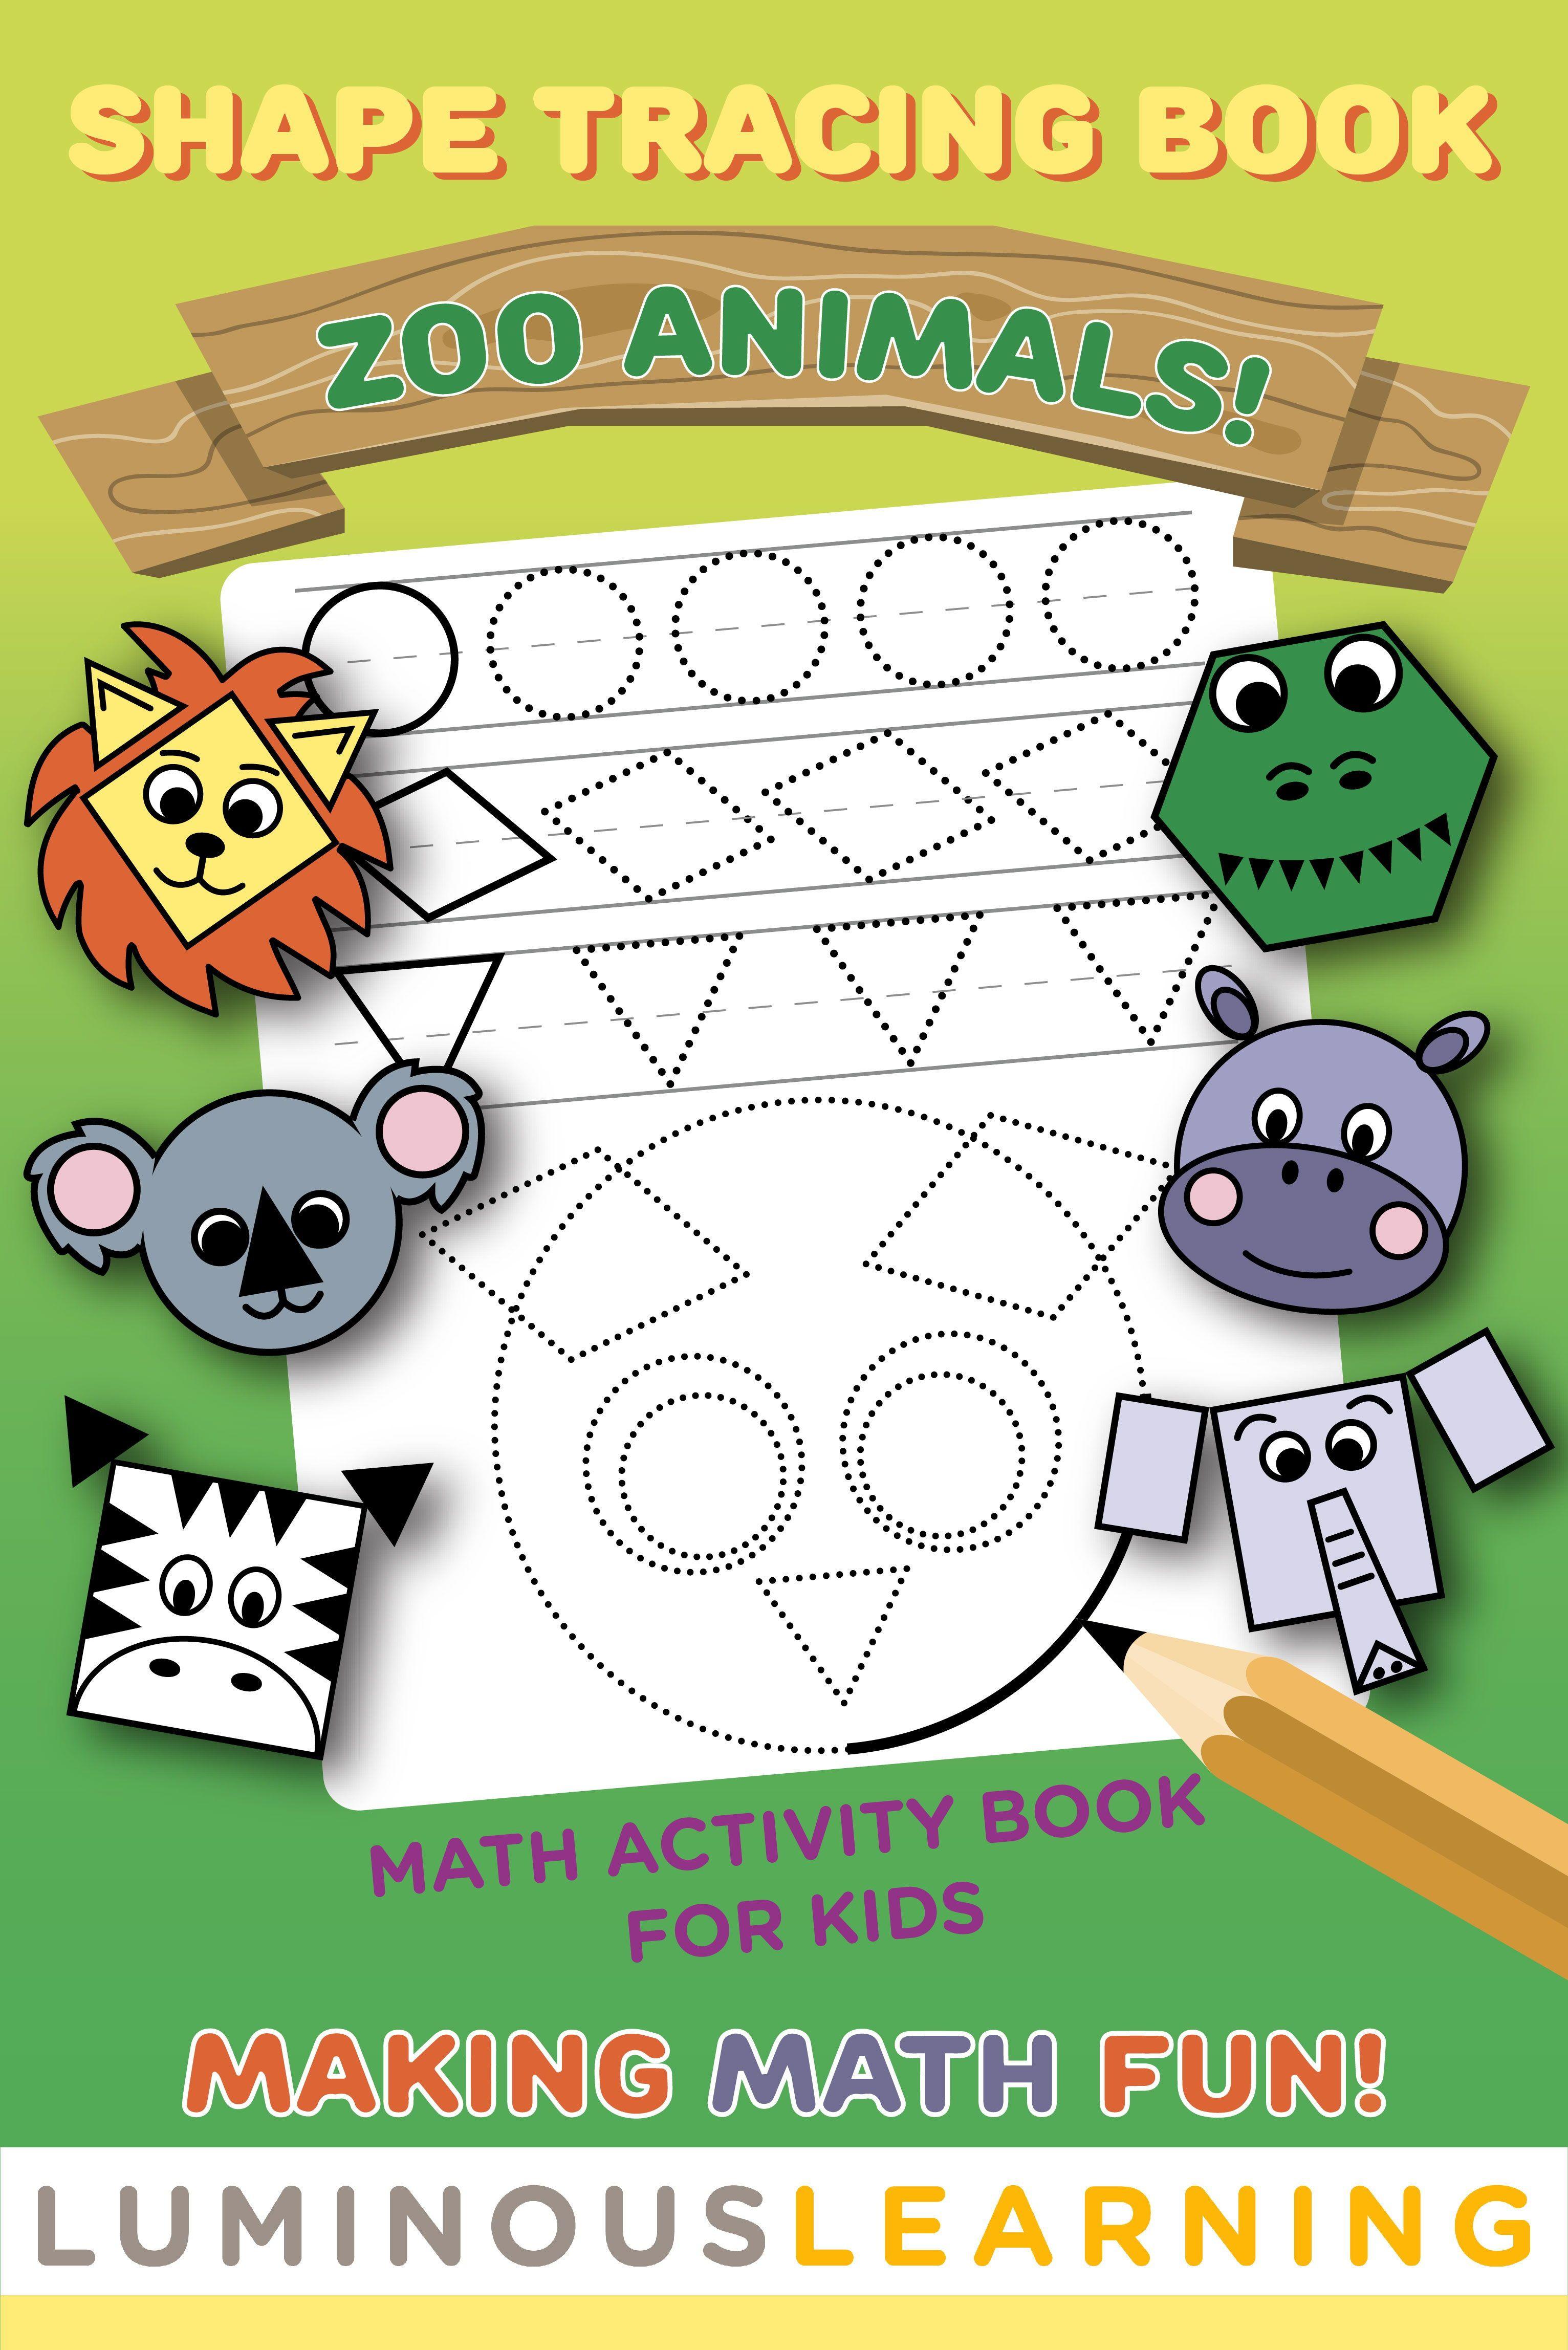 Shape Tracing Book Zoo Animals Jumbo Math Activity Book